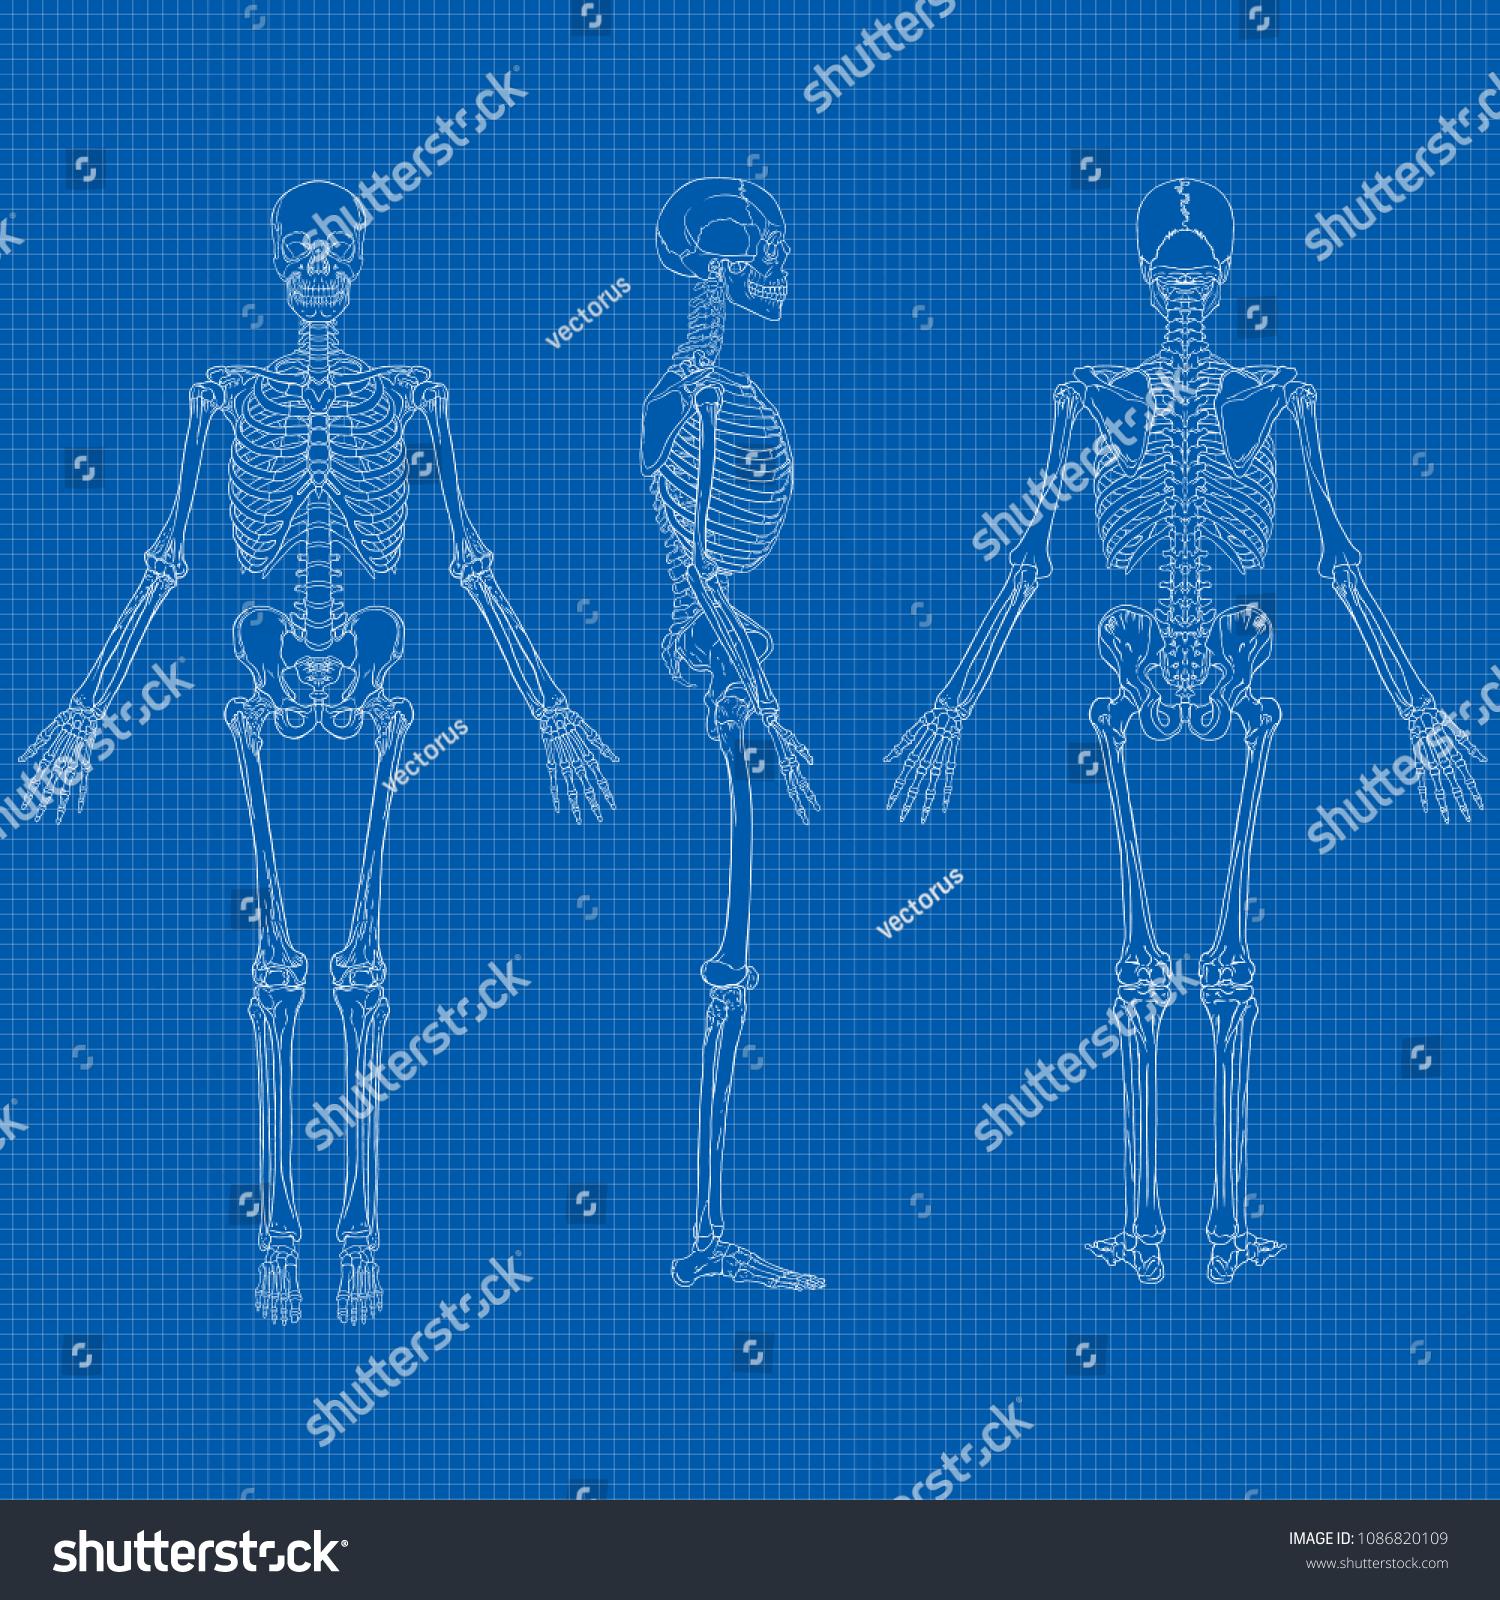 hight resolution of vector illustration of human skeleton drawing